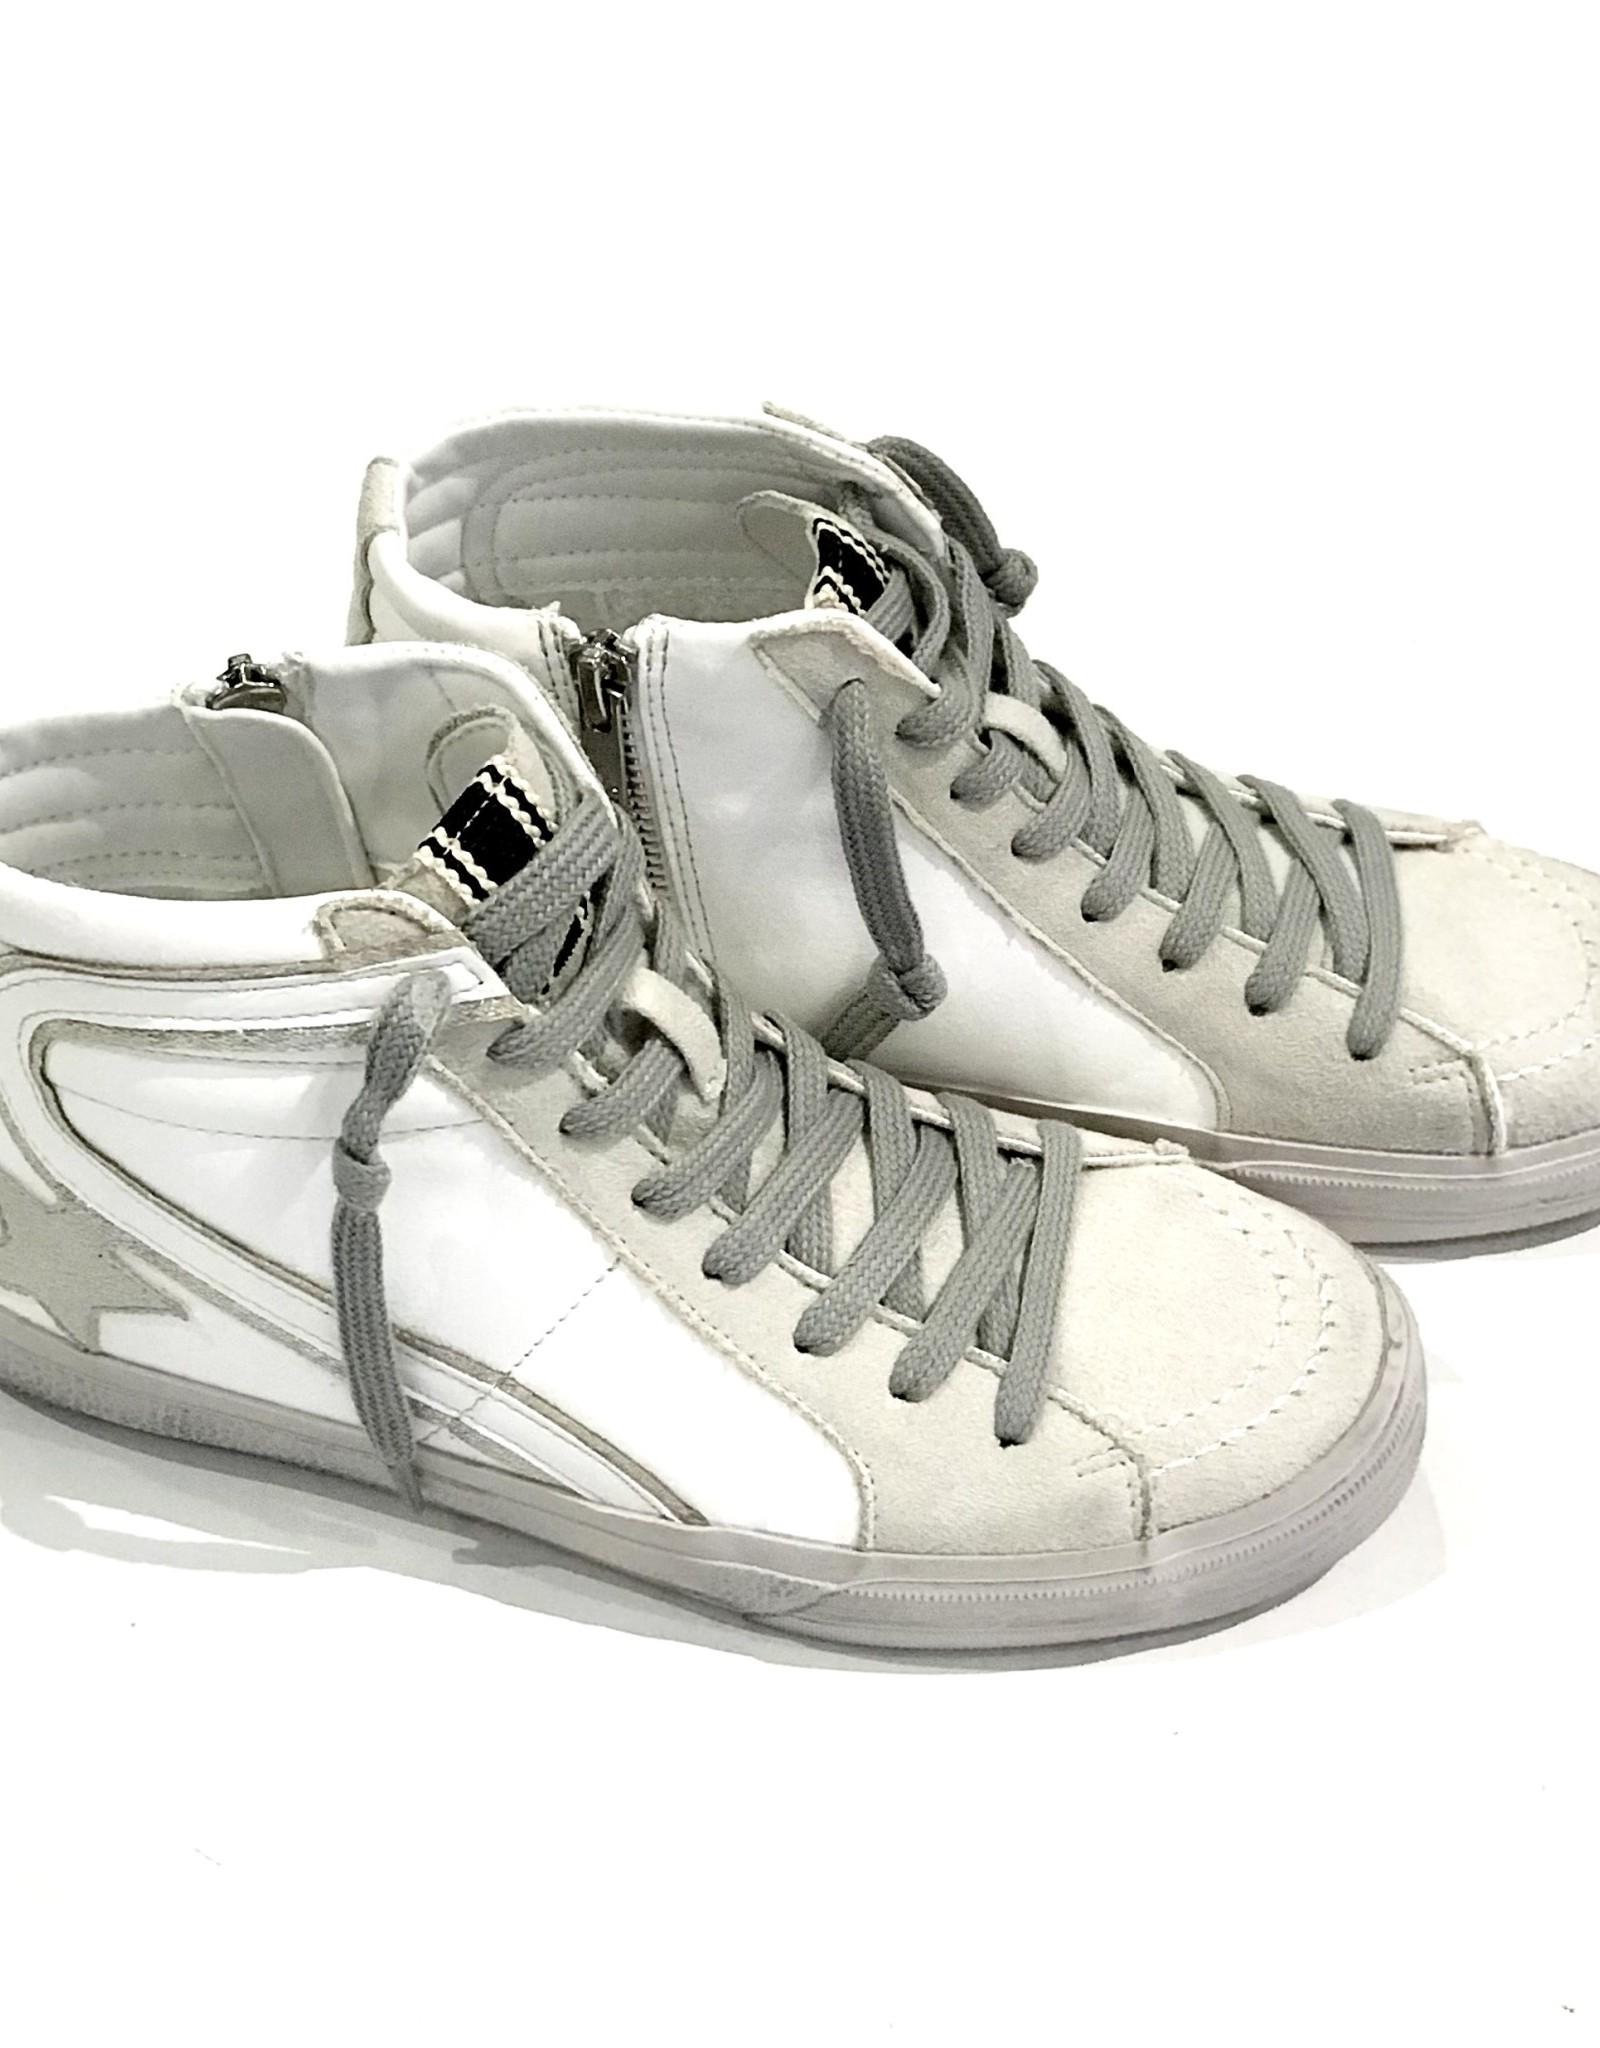 shushop shushop hightop sneakers